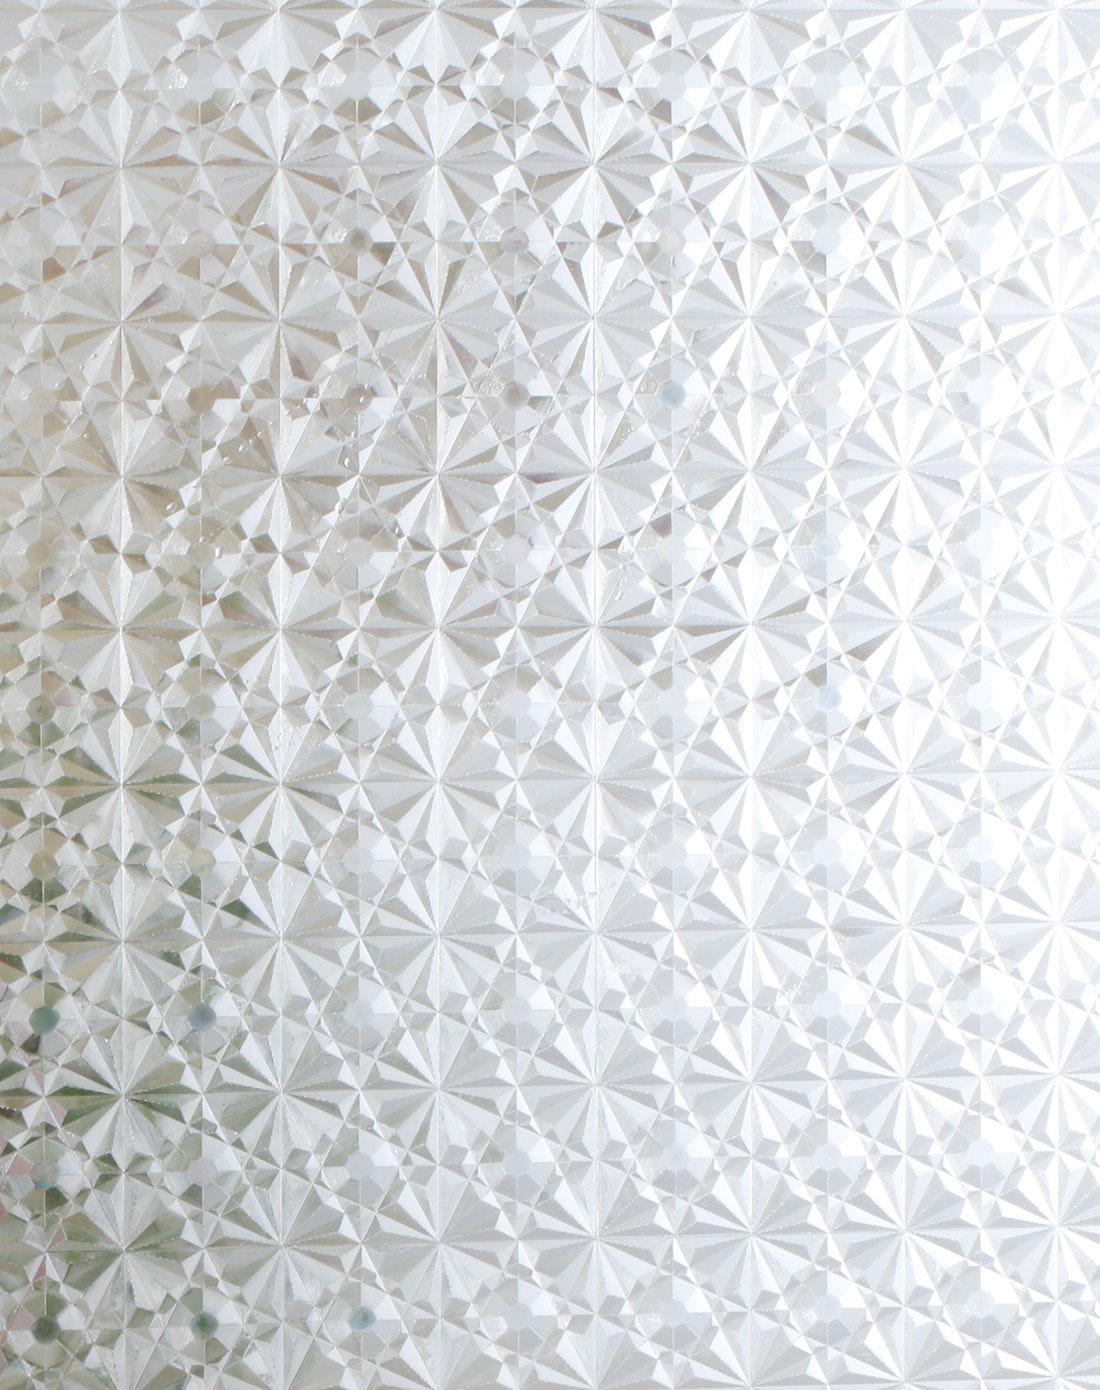 3d钻石花纹静电玻璃贴60cm*2m